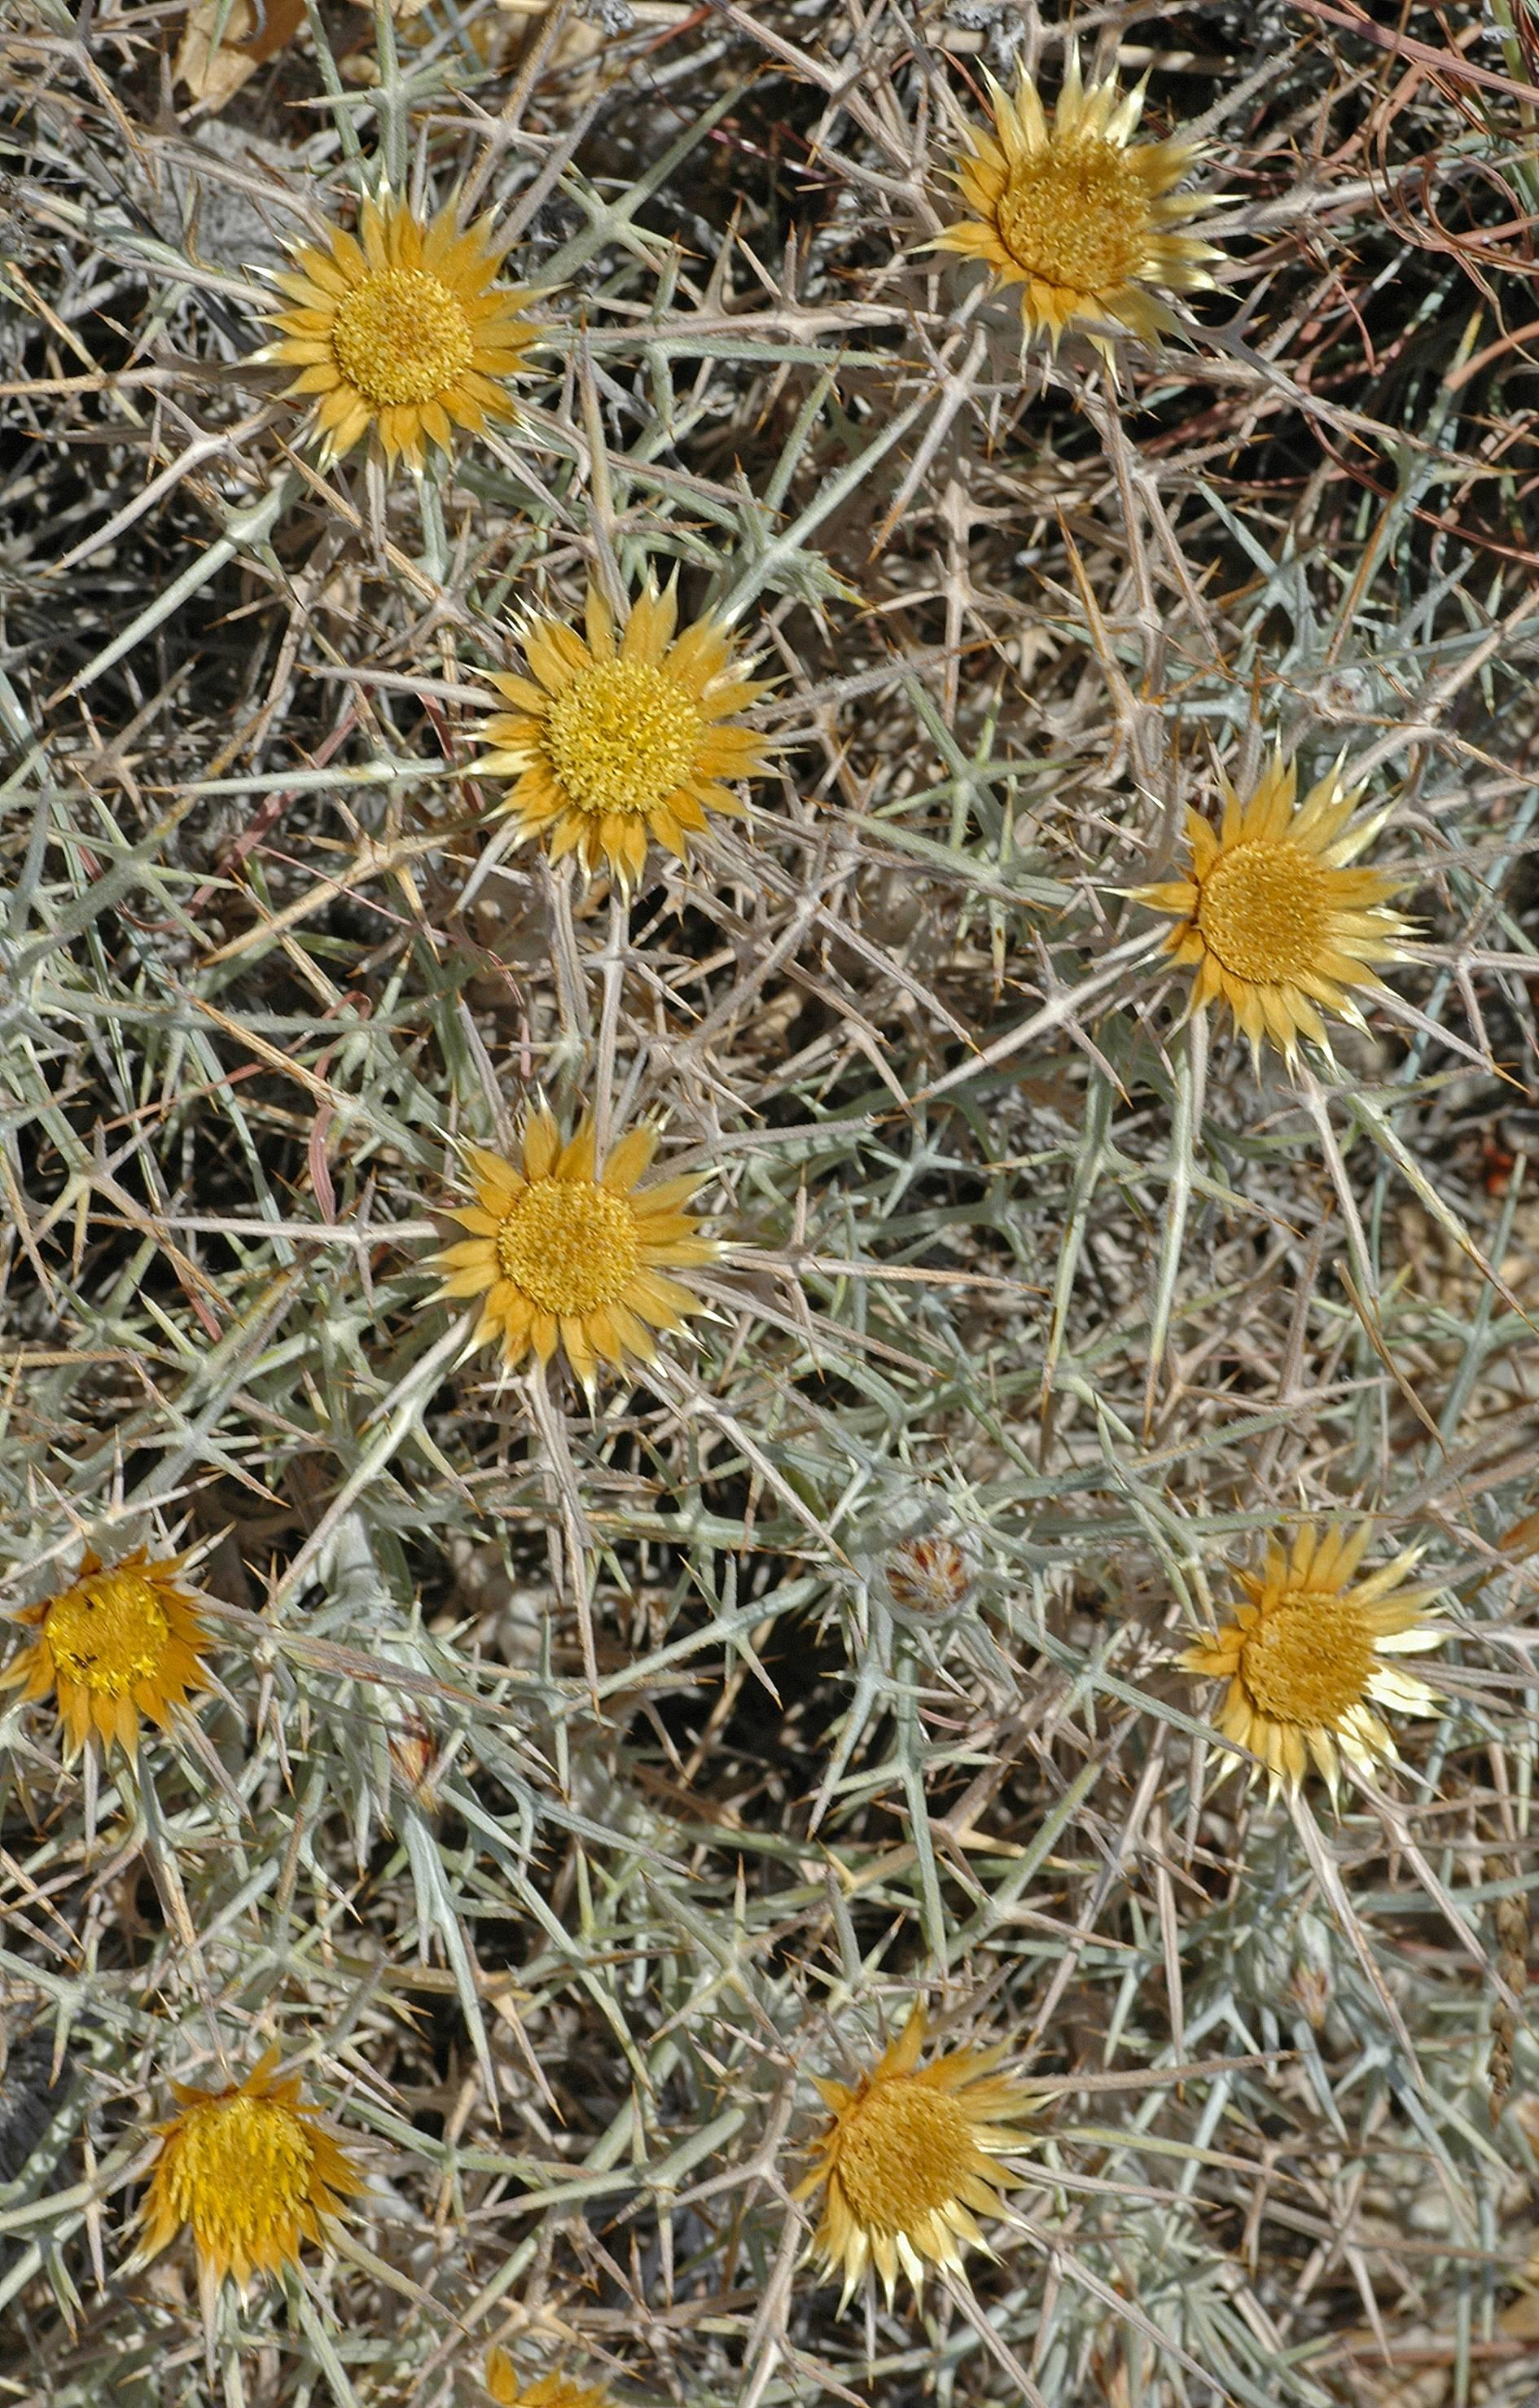 https://media.e-taxonomy.eu/flora-greece/large/Plate_03/CarlinaTragacanthifolia20.jpg